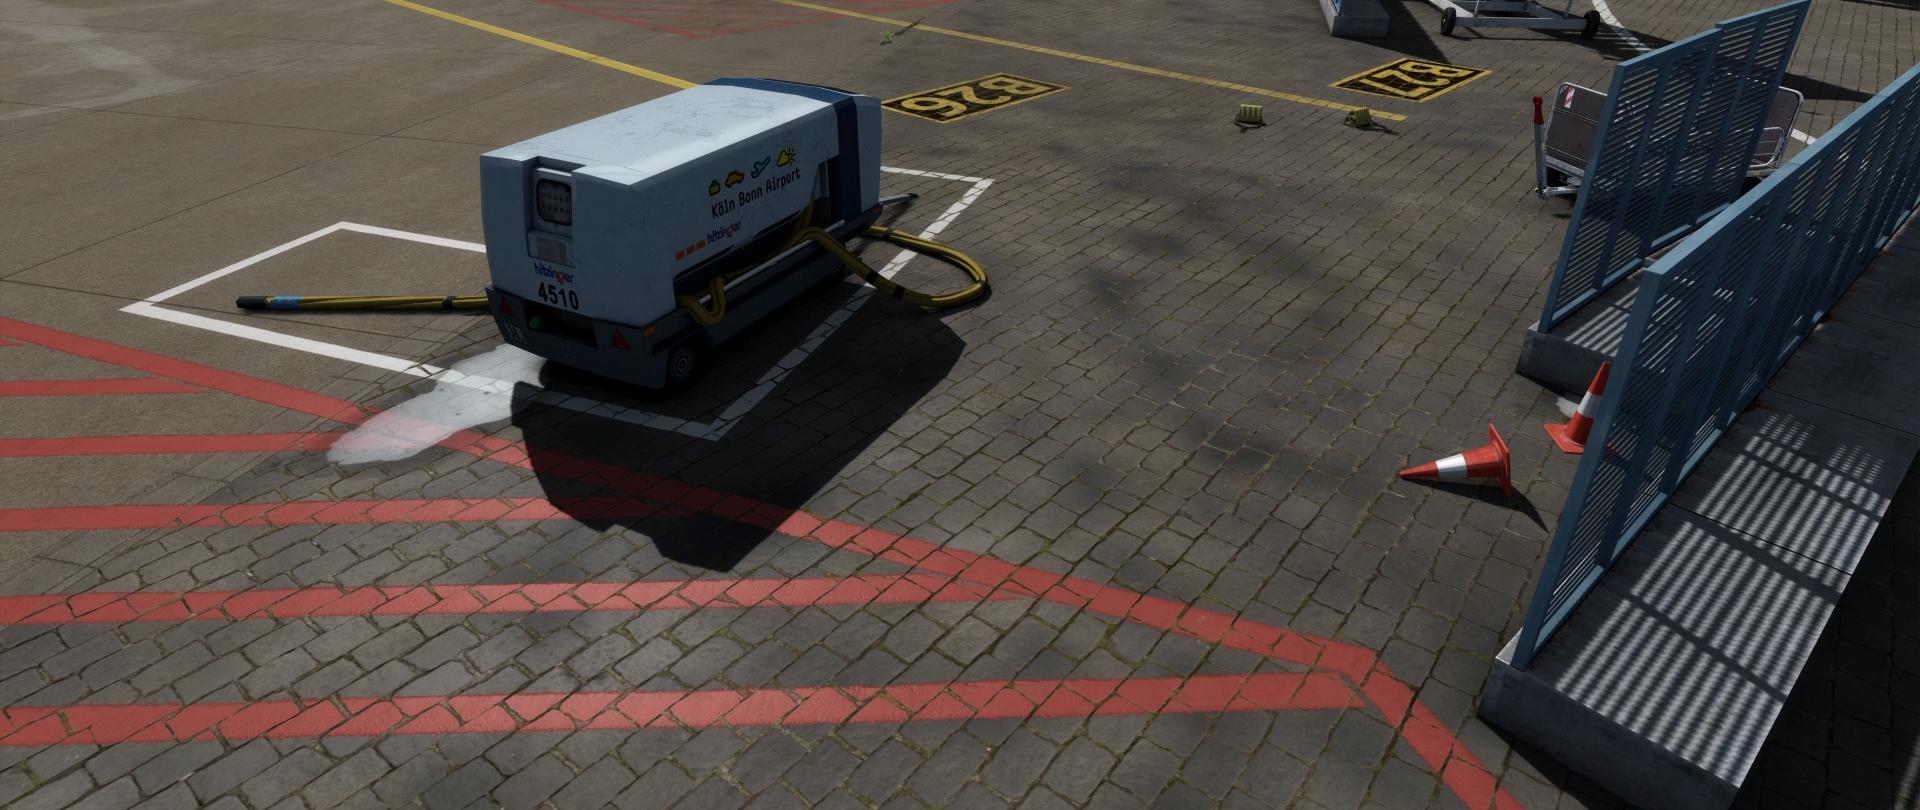 joerlendsund-aerosoft-cologne-eddk-image02